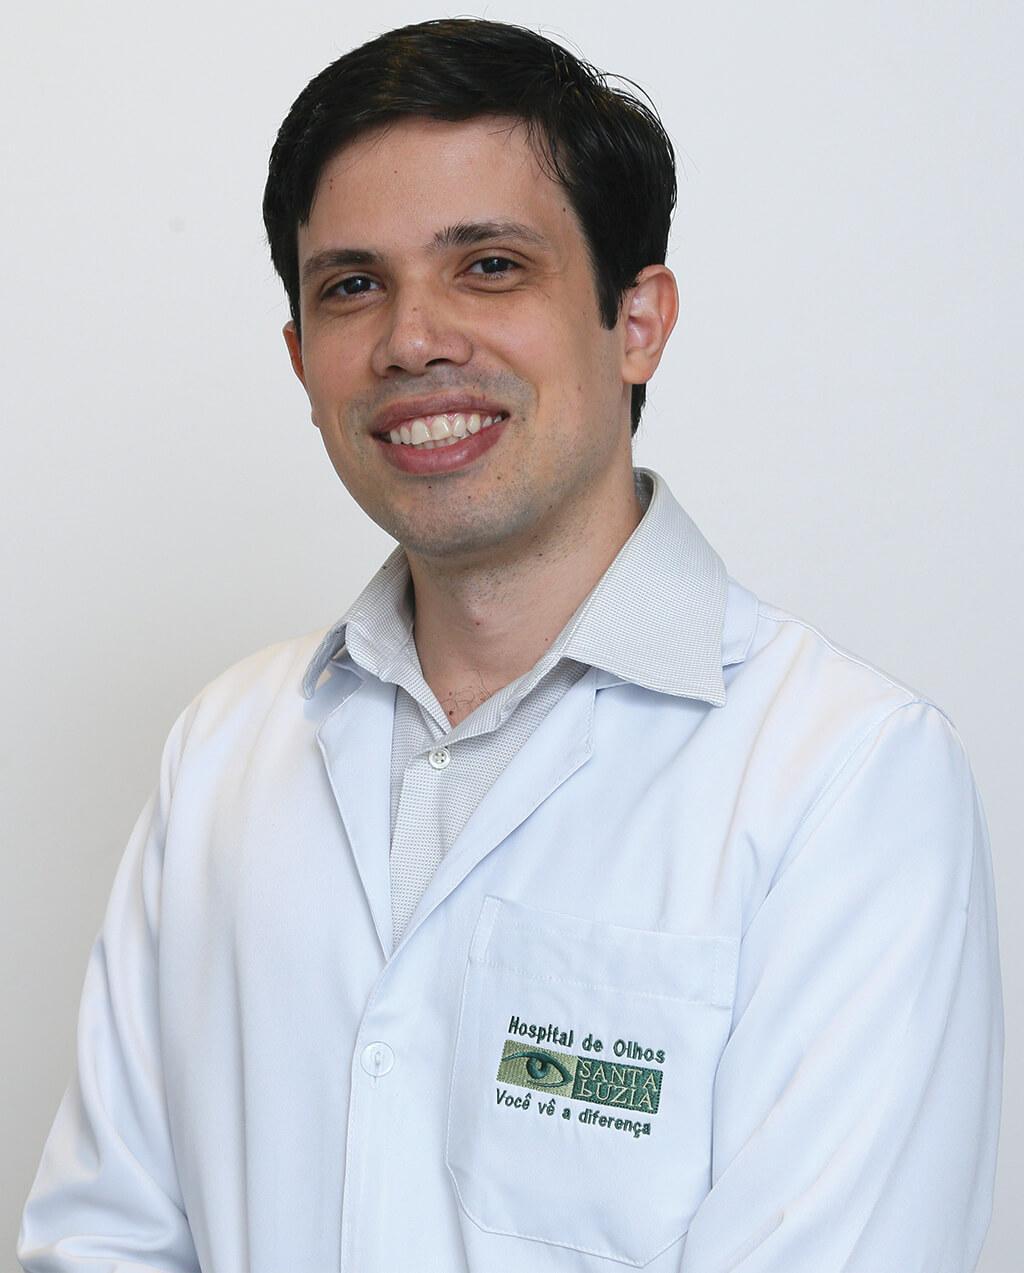 Natanael Figueiroa